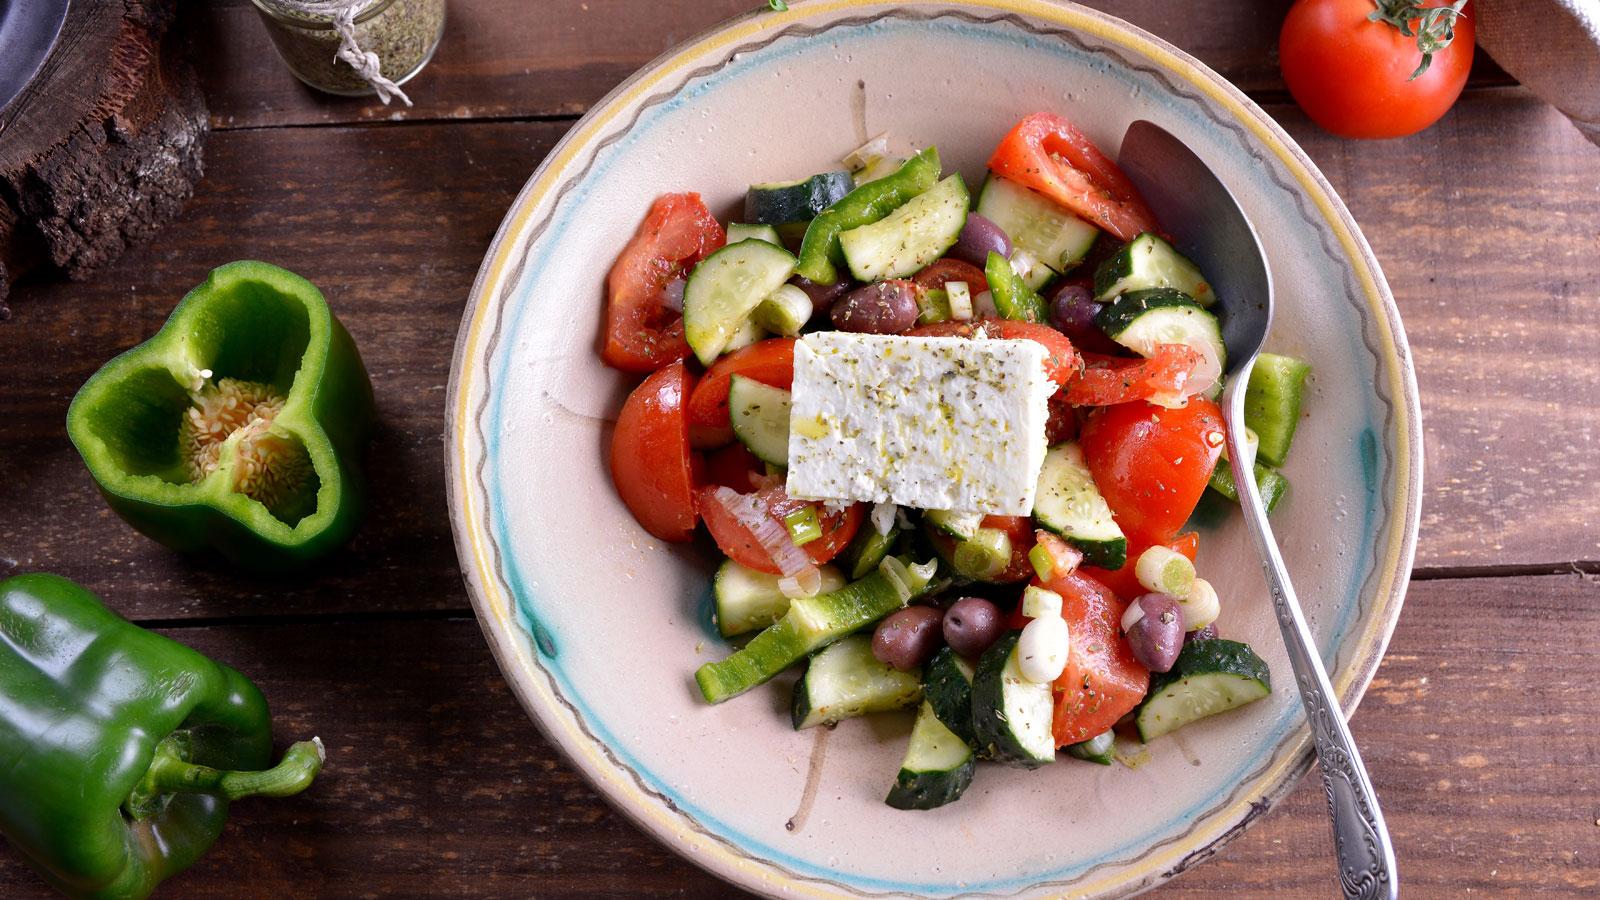 ensalada griega salata jori tiki mar a zannia receta